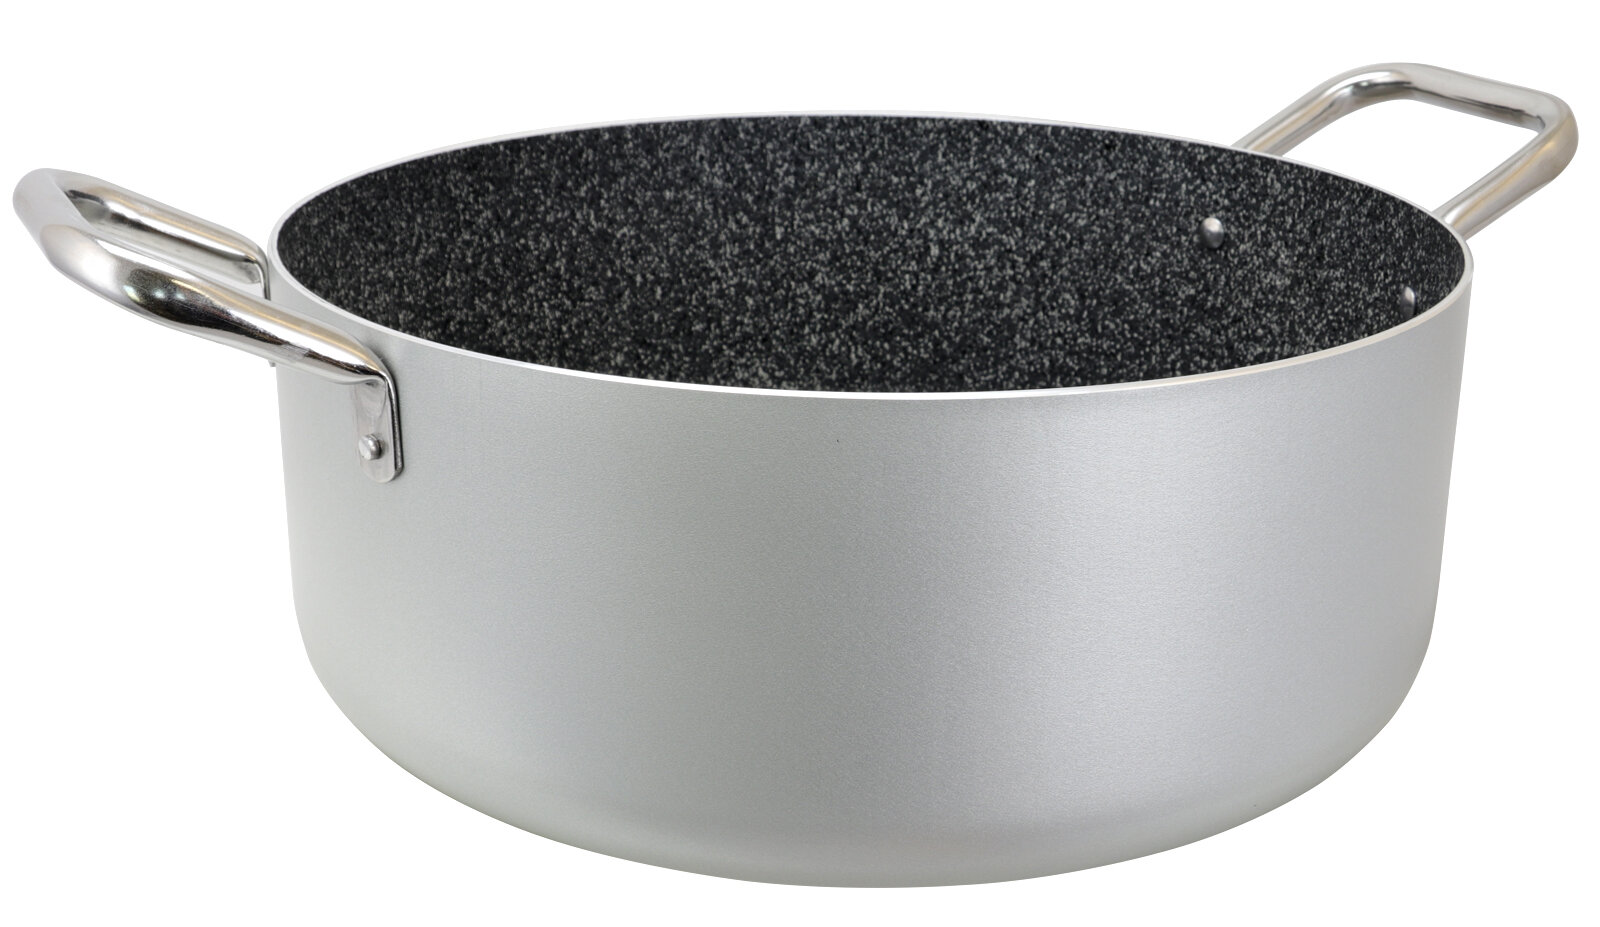 Casserole Induction Compatible Vitroceramique robusto 13.25 qt. non-stick aluminum round casserole